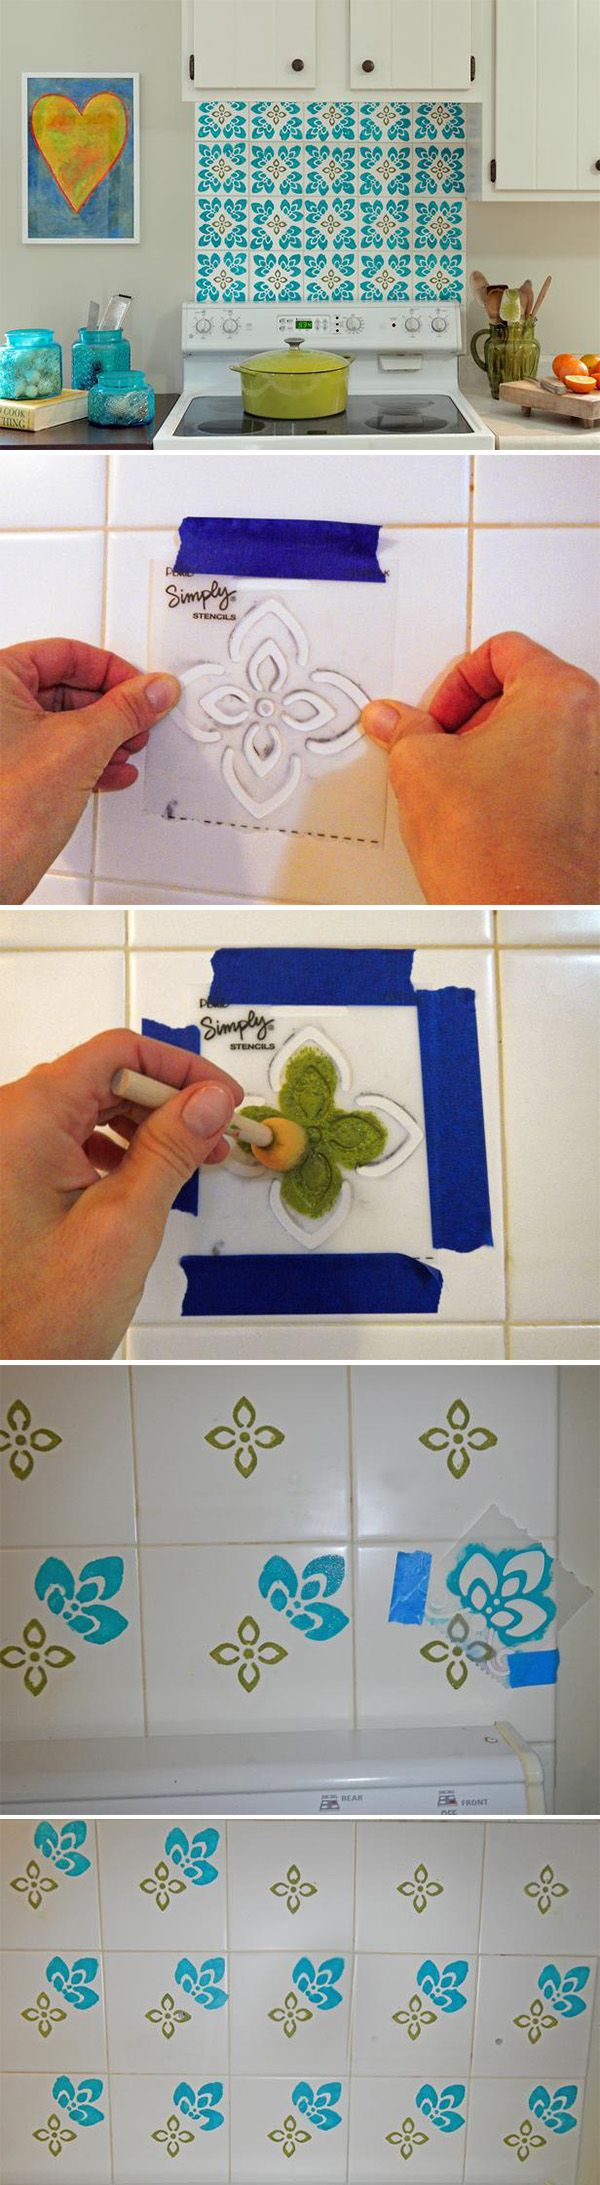 How to paint backsplash tile diy painting pinterest - Kreative wandbemalung ...